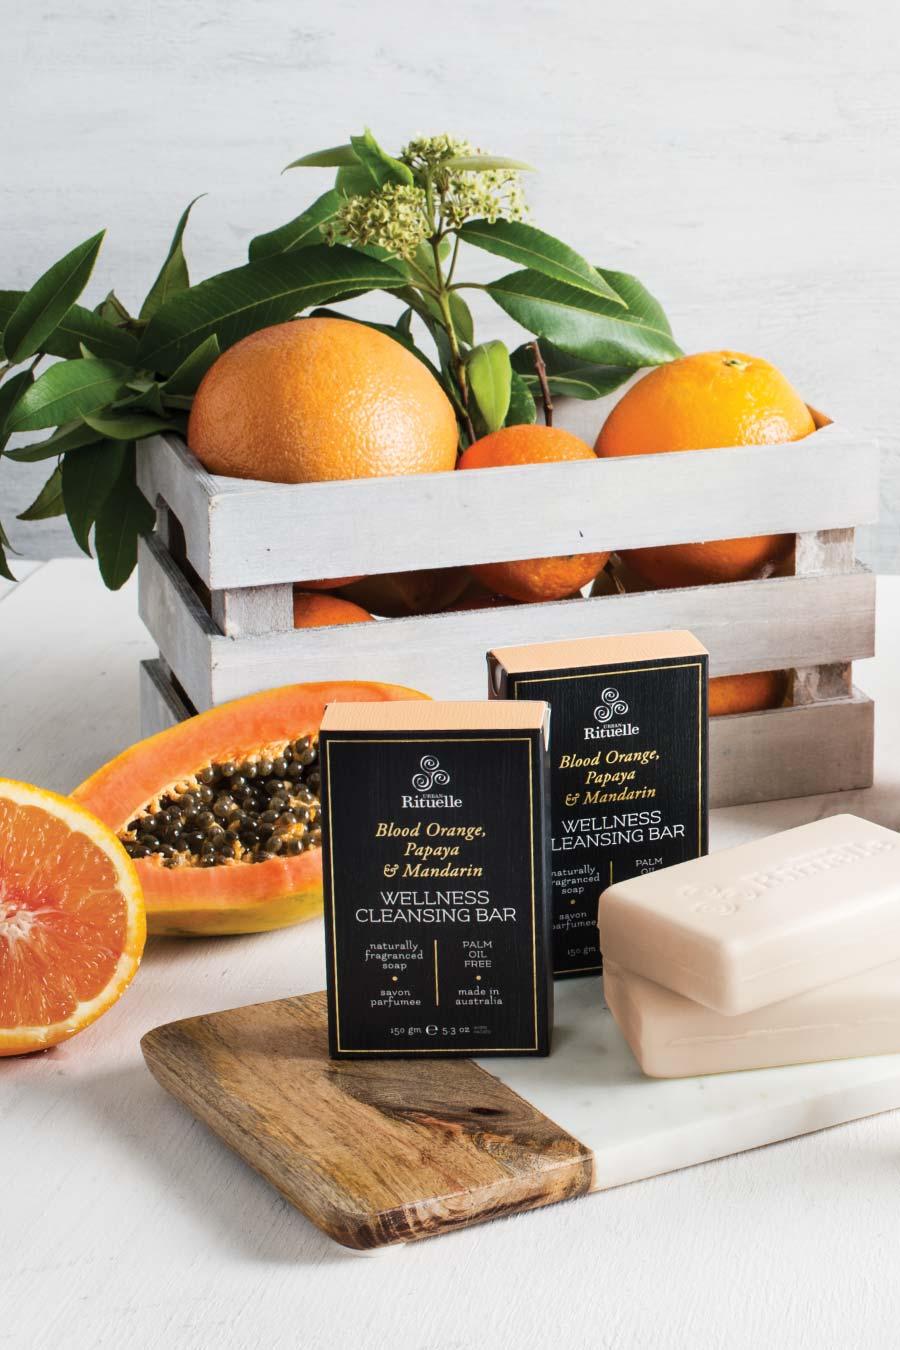 Harvest Blood Orange Wellness Cleansing Bar